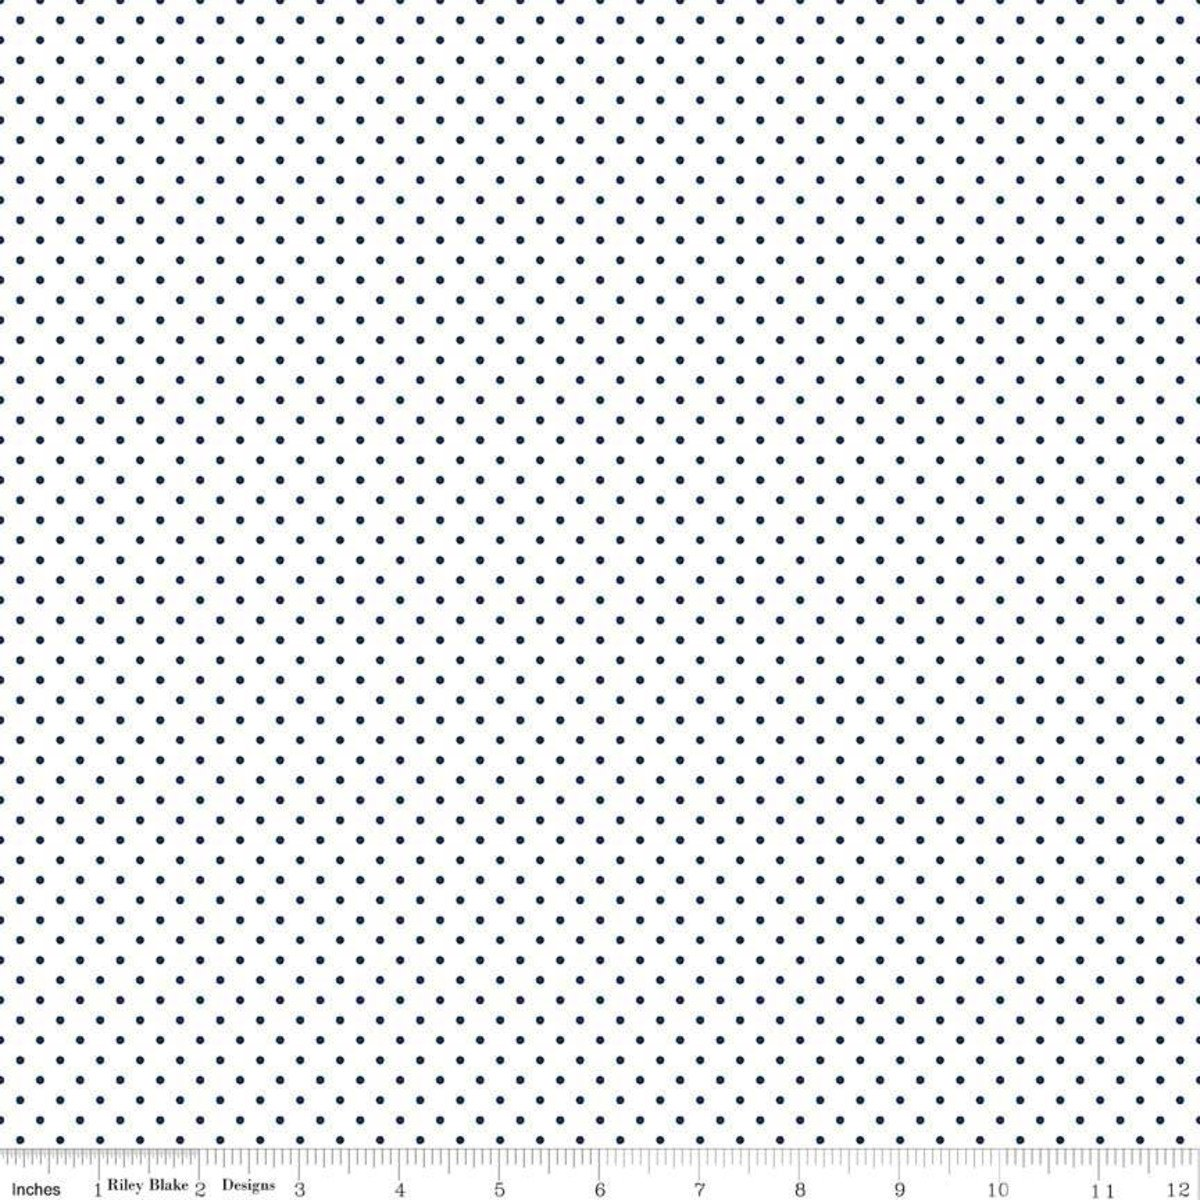 Riley Blake Designs, Swiss Dot - Swiss Dot Navy on White